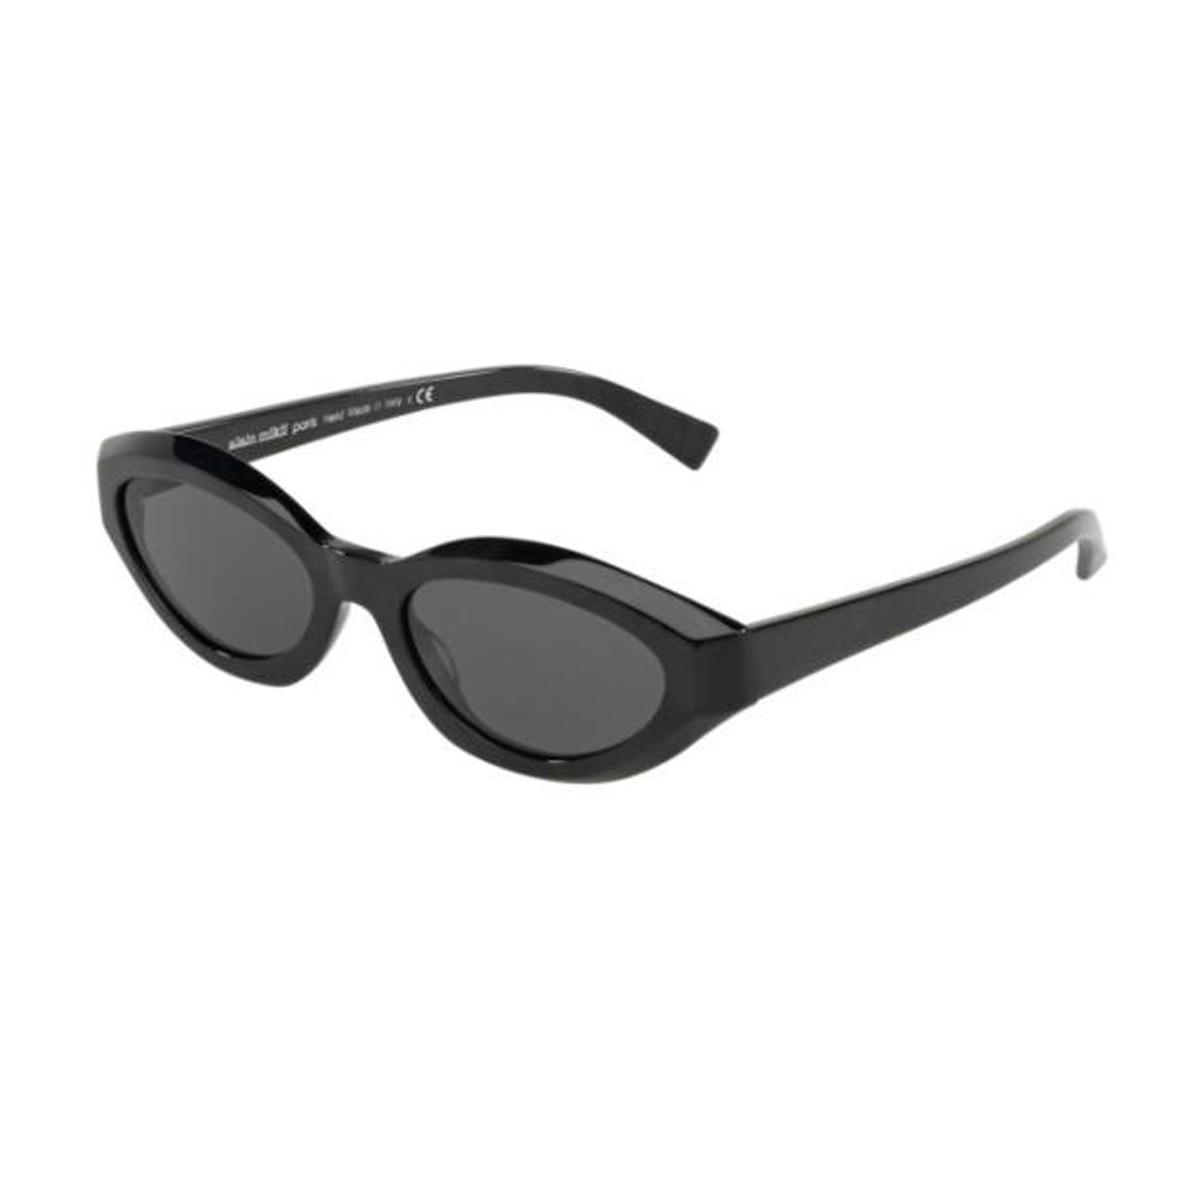 Alain Mikli 0A05038 | Women's sunglasses